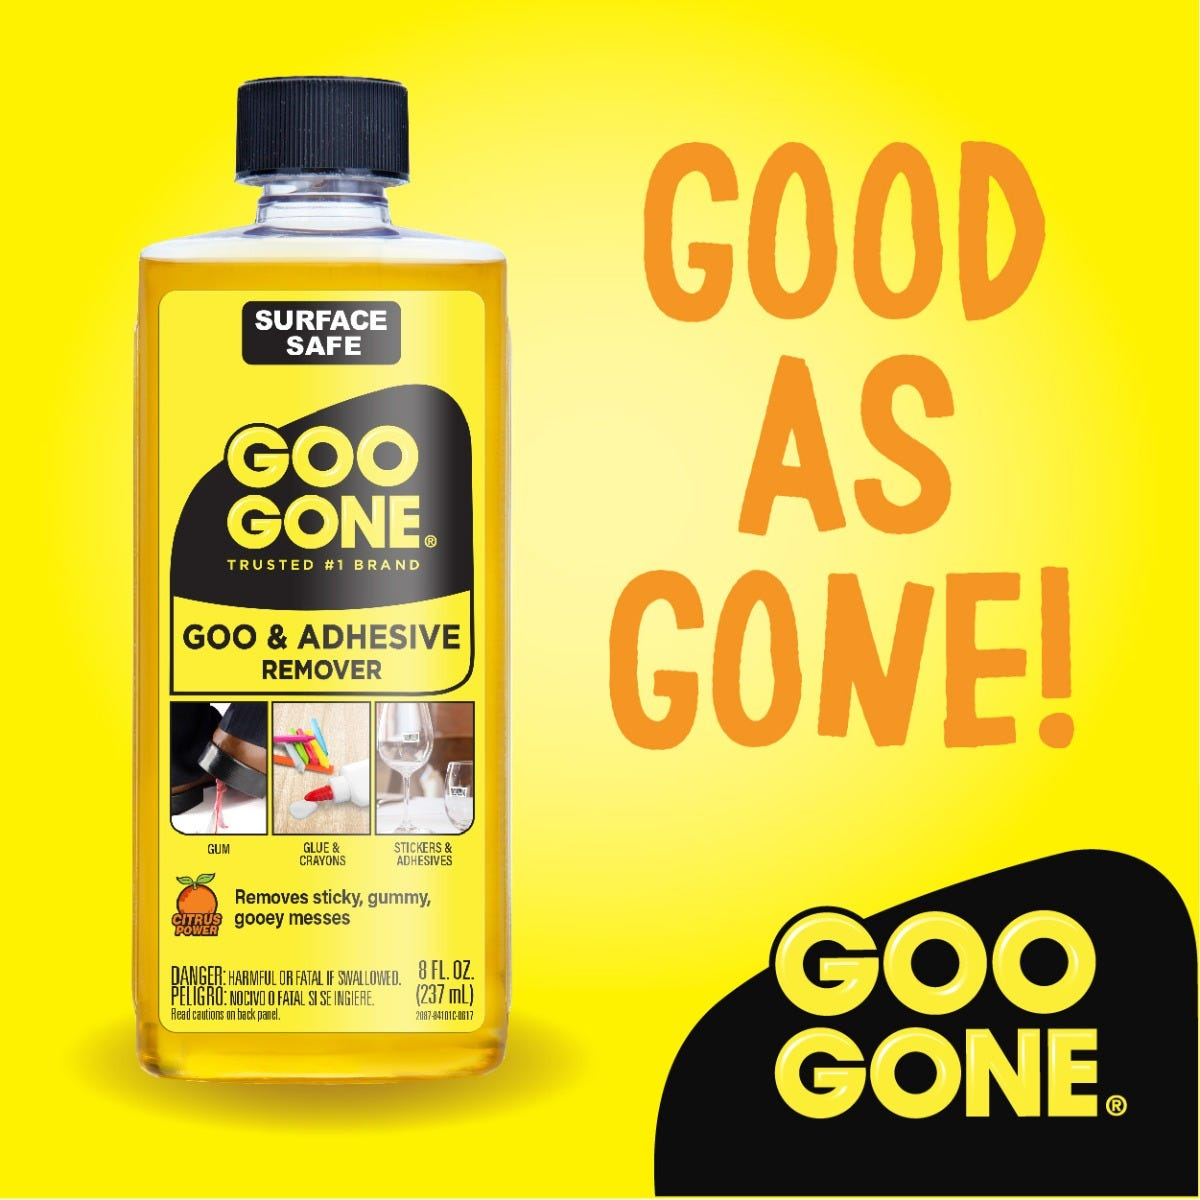 https://googone.com/media/catalog/product/g/o/goo_gone_original_8oz_gone.jpg